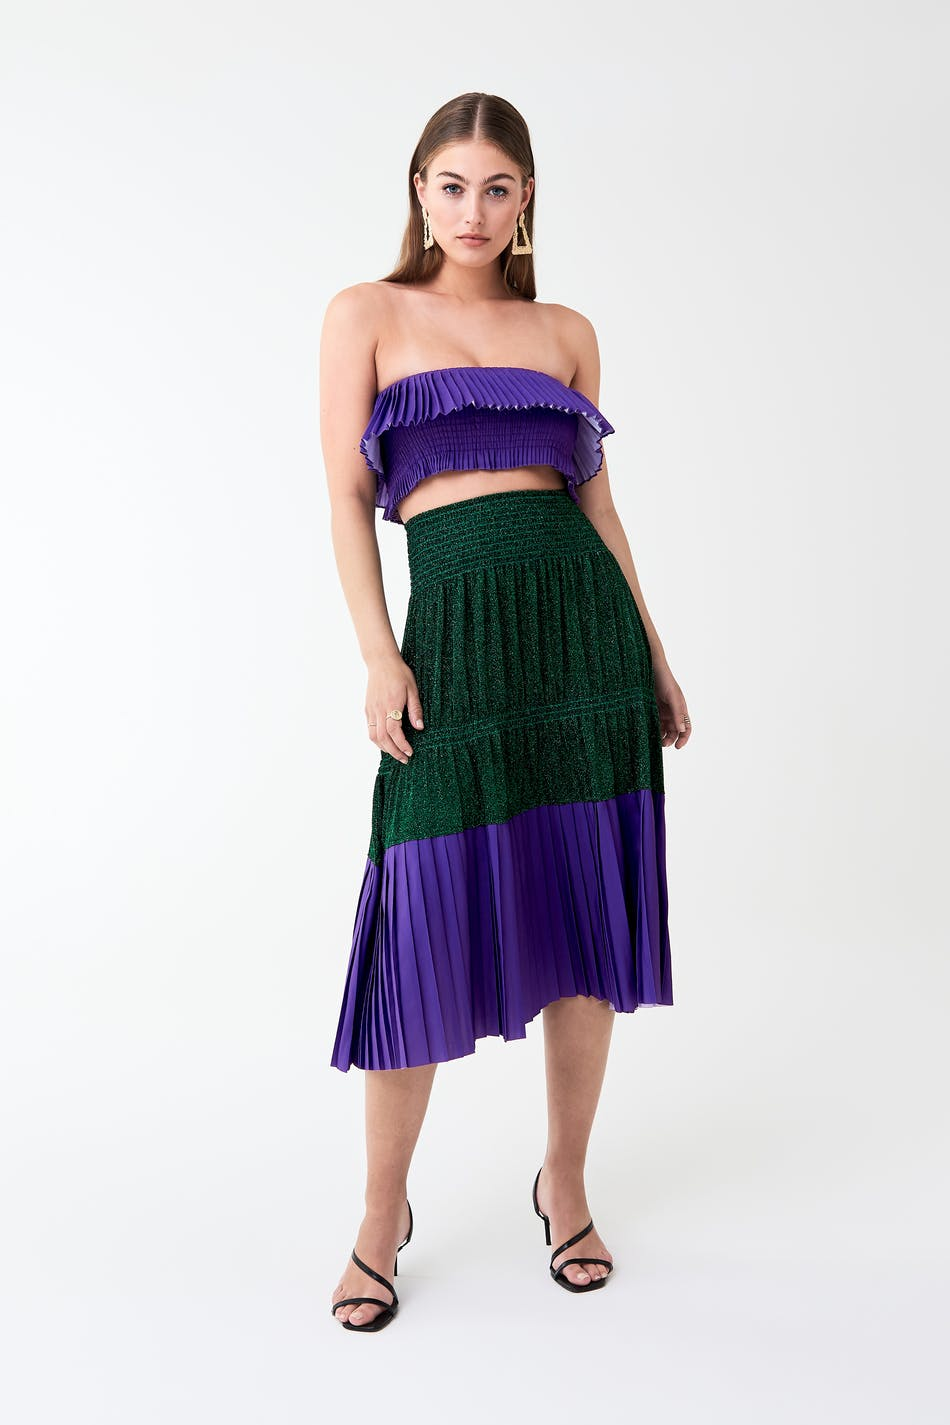 Six skirt